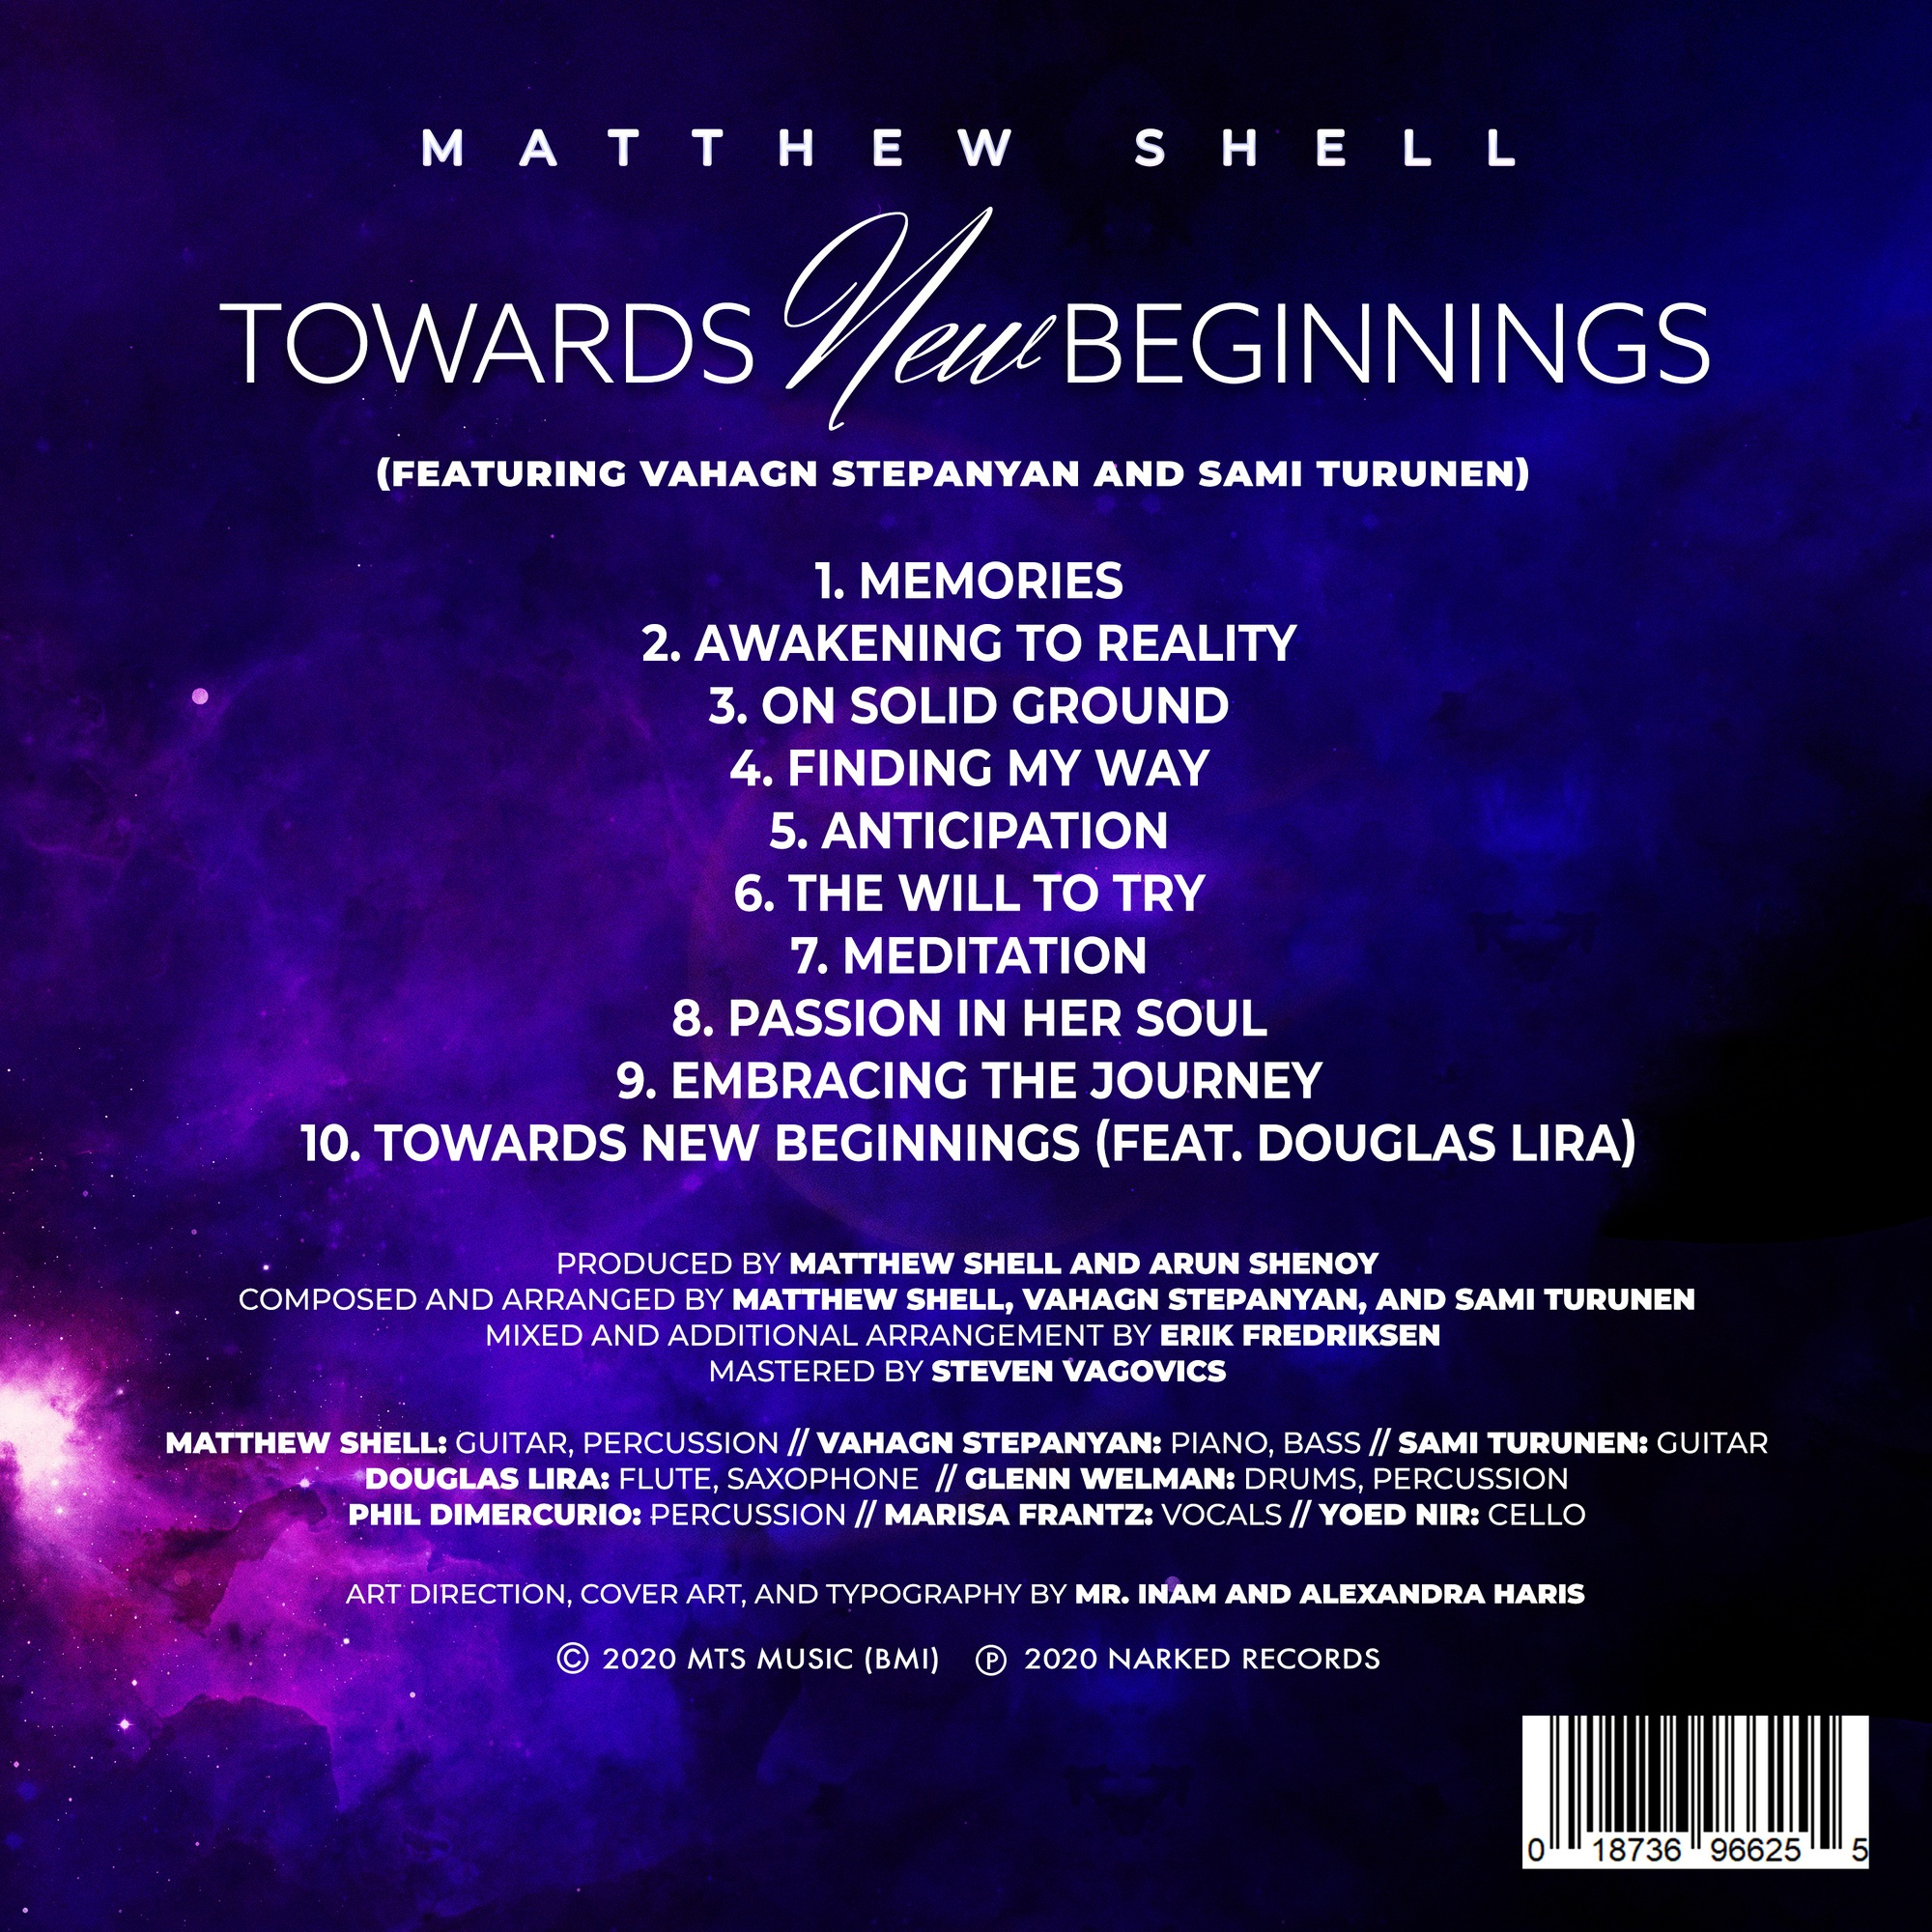 Towards New Beginnings- Credits Sheet